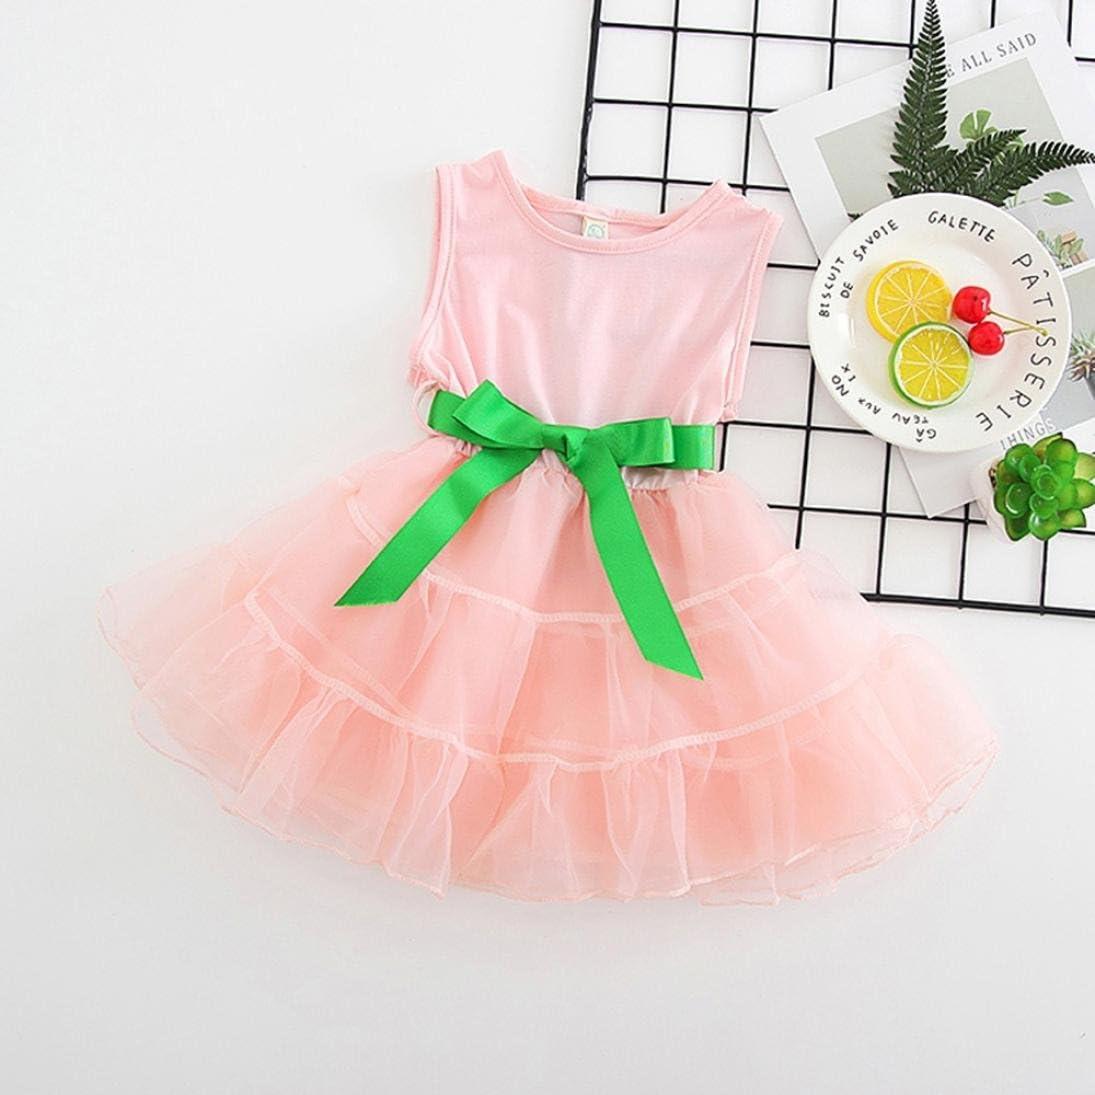 Memela Baby Little Girls Clothes Bowknot Net Yarn Dress 1-4 Years Spring//Summer